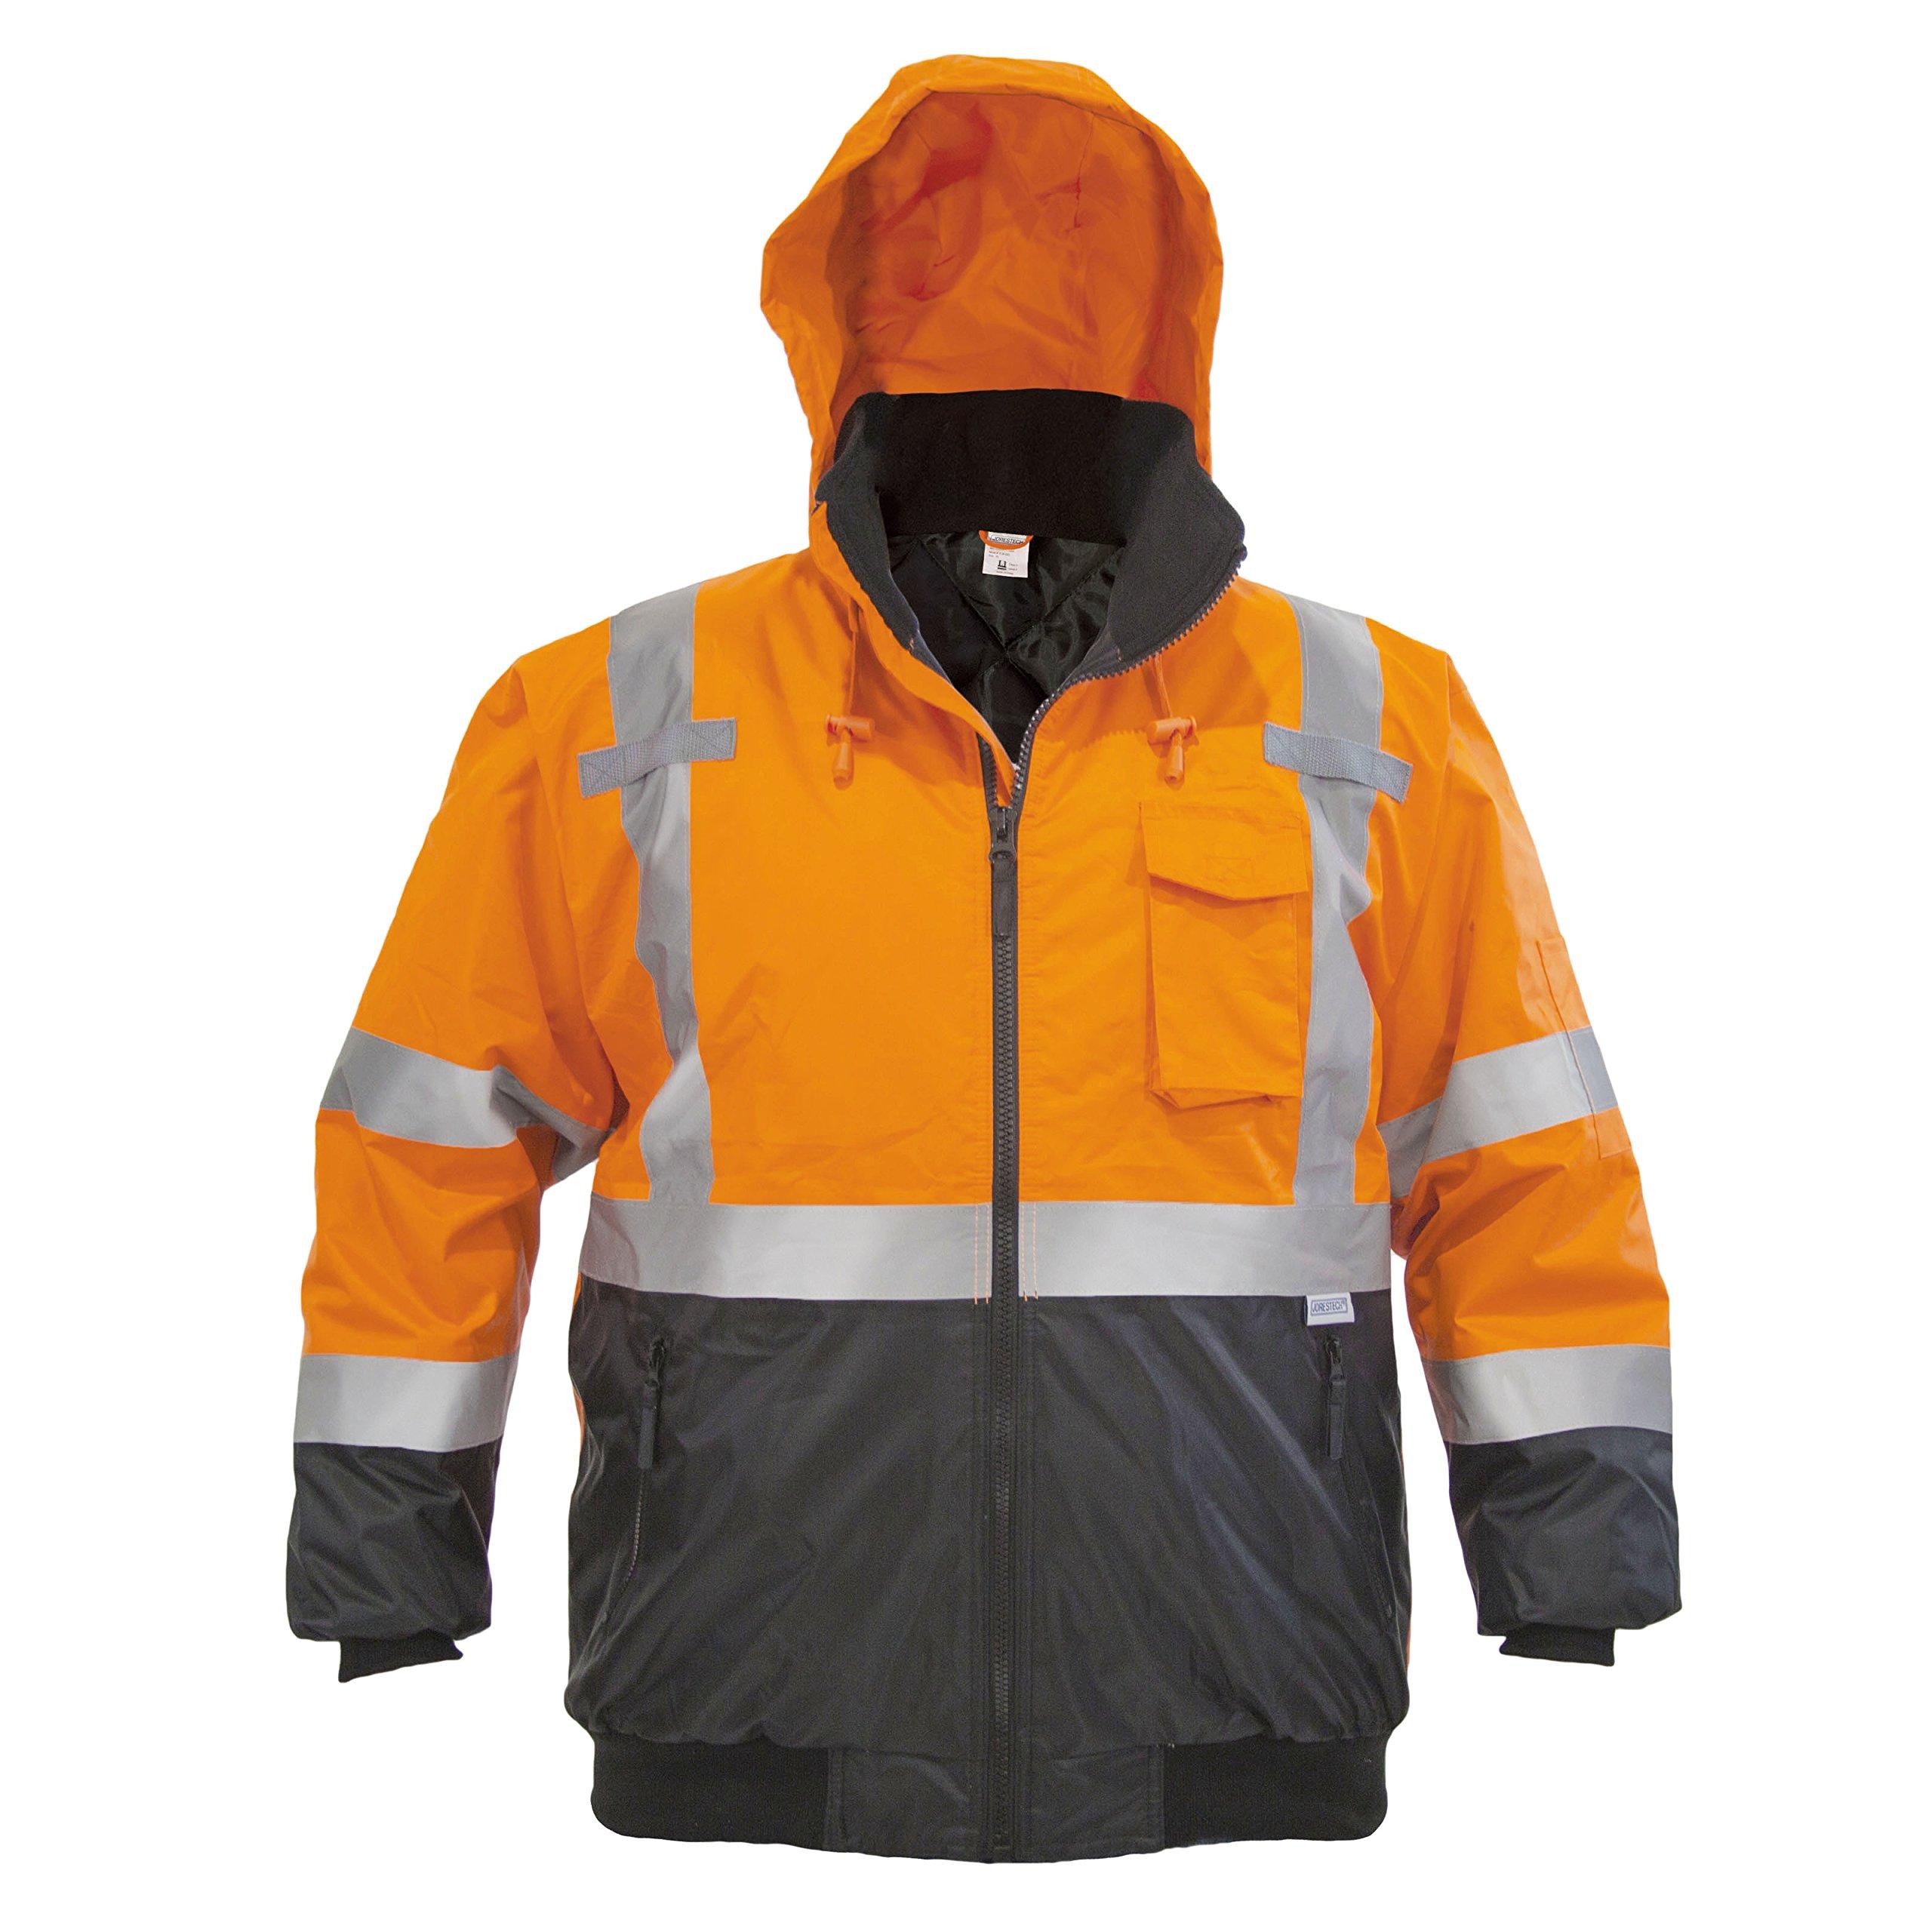 JORESTECH High Visibility Waterproof Bomber Jacket (3X-Large, Orange) by JORESTECH  (Image #3)